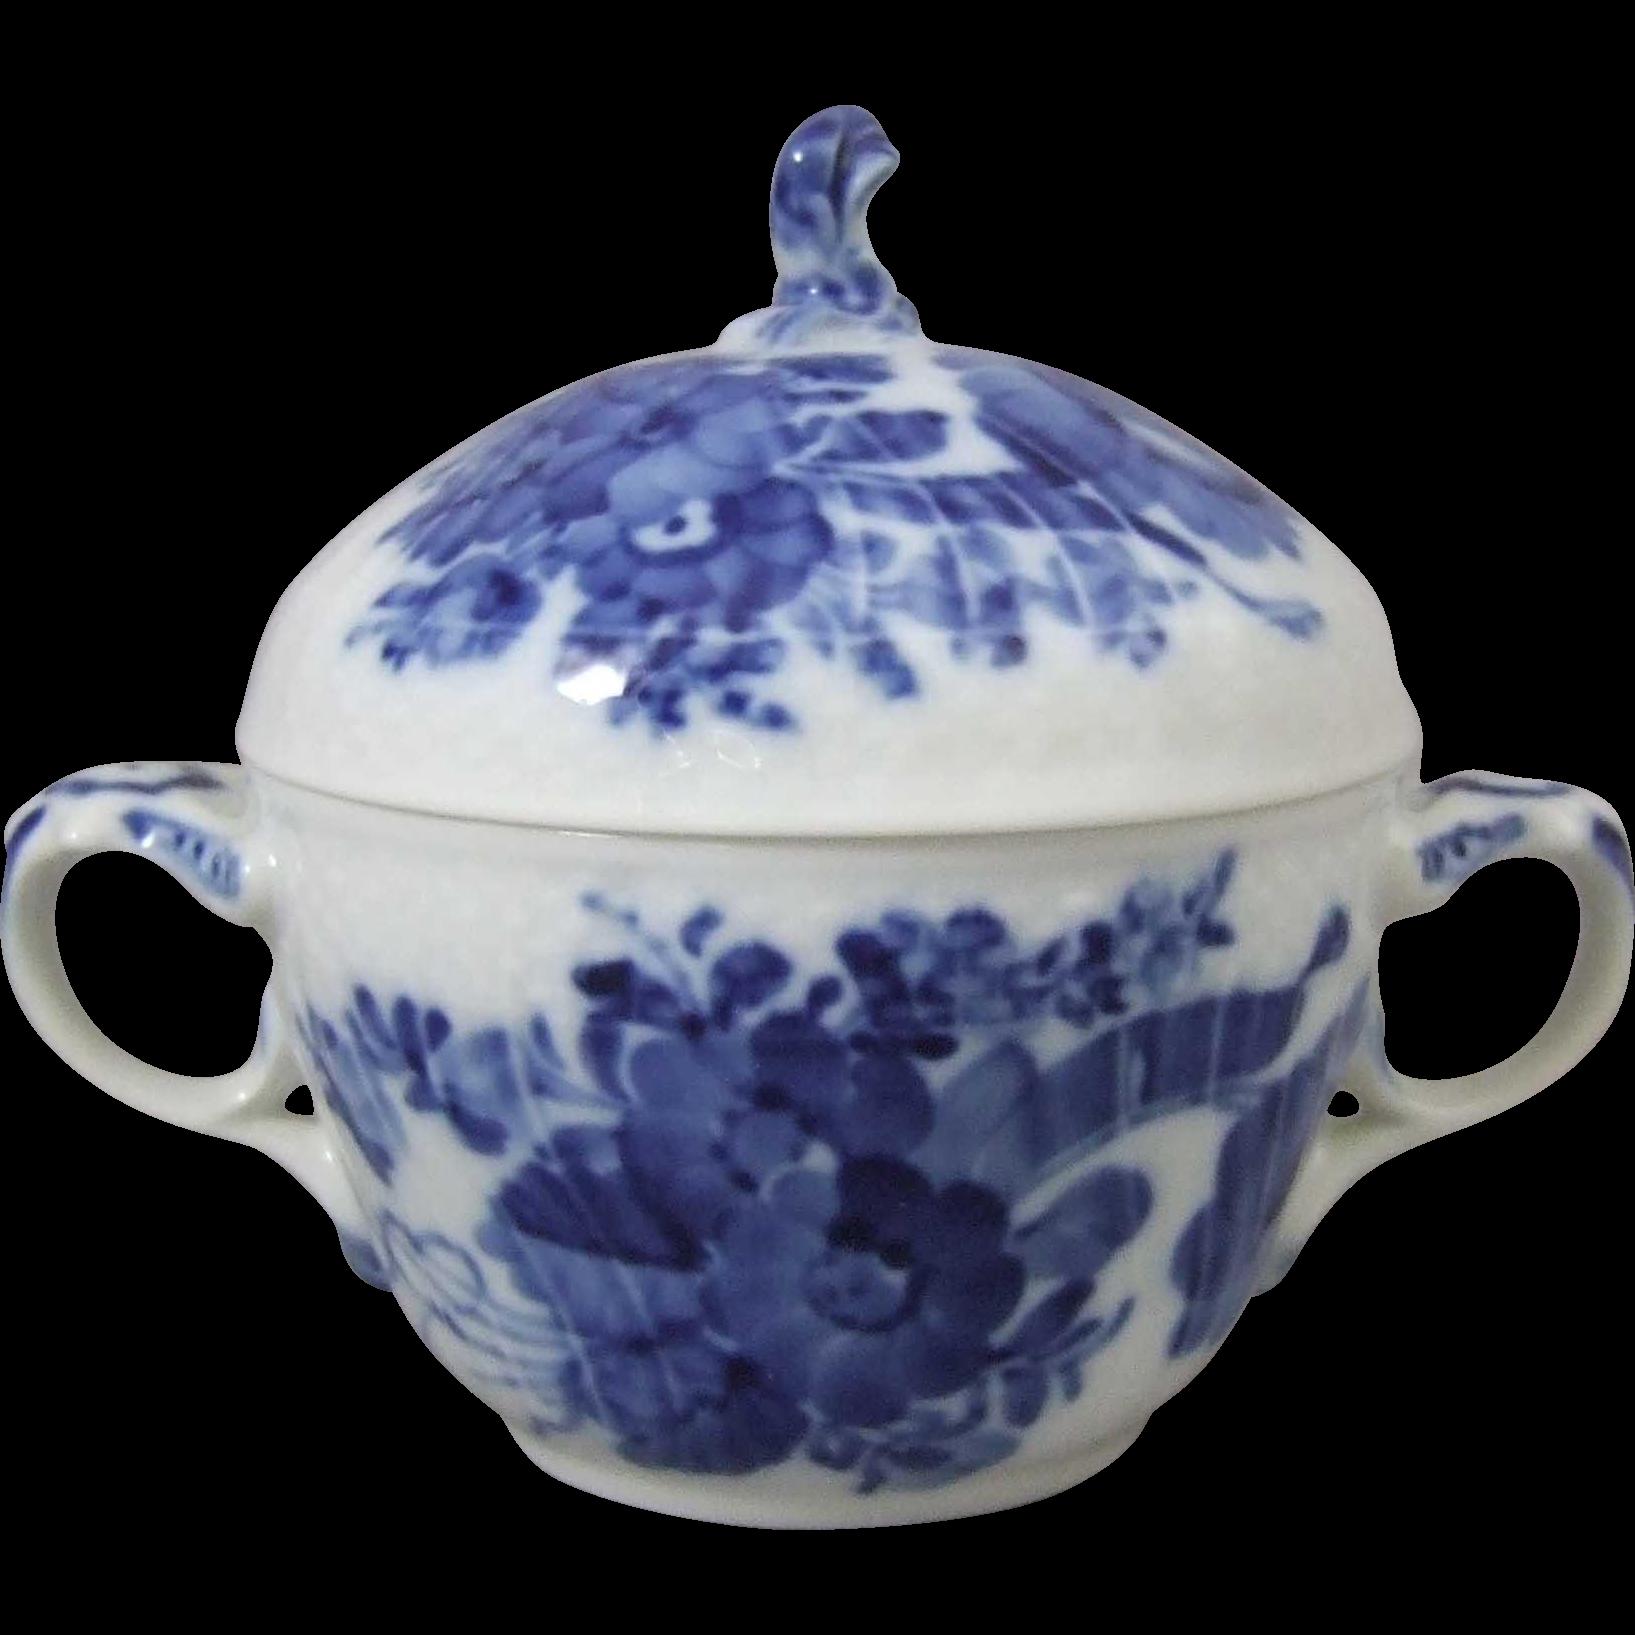 Royal Copenhagen Blue Flower Curved 161 Sugar Bowl